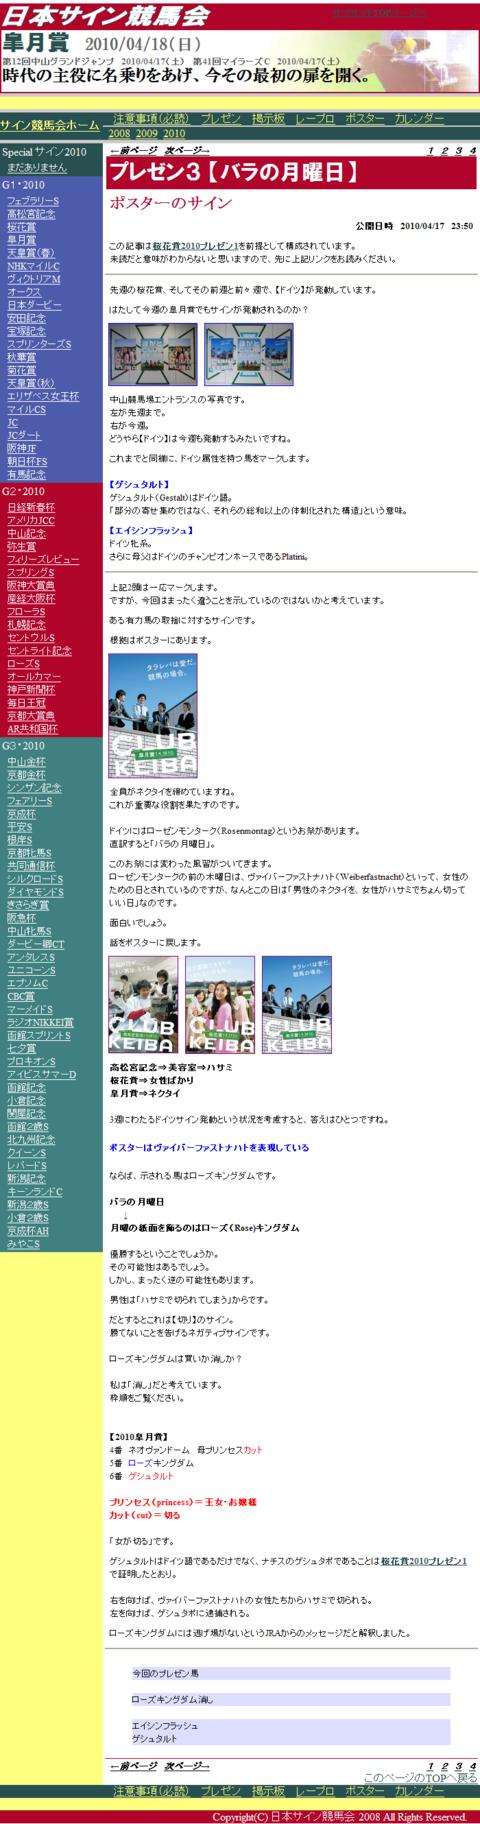 Sample20100418satsukisho